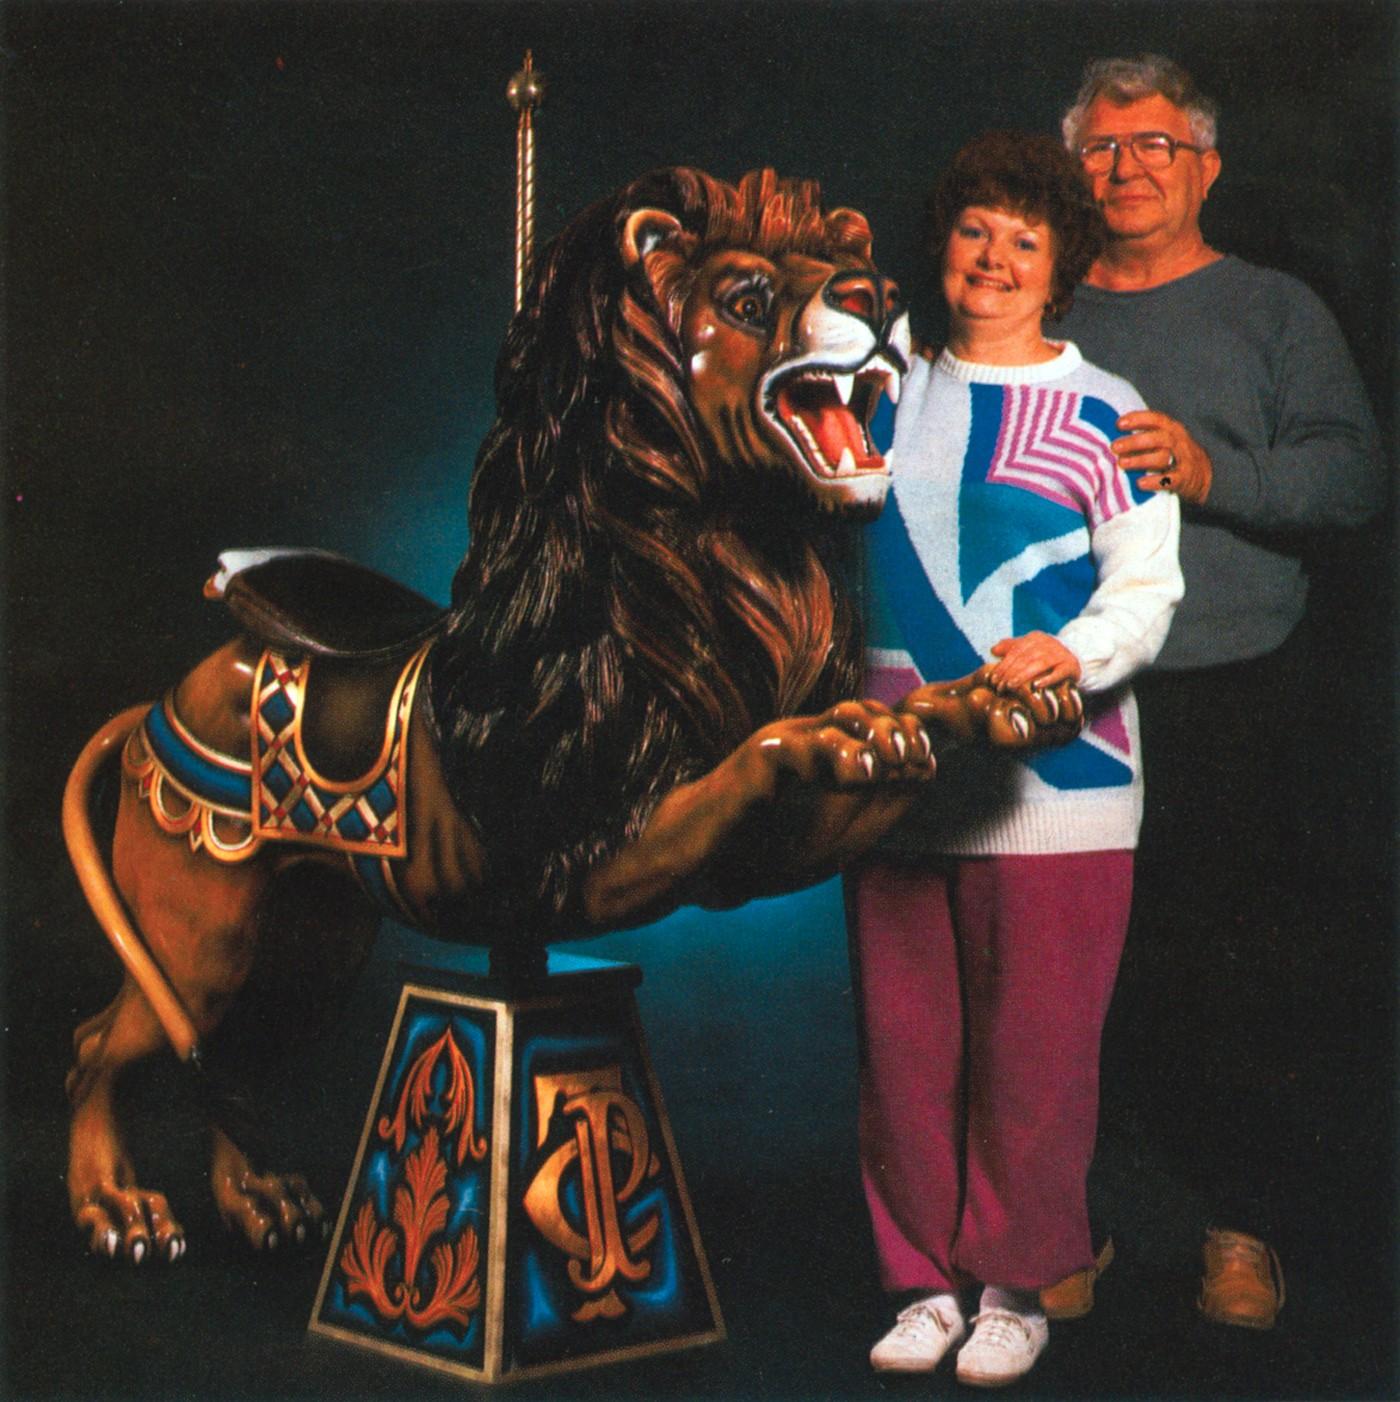 Skylon-Towers-Niagara-carousel-lion-Corey_6-88